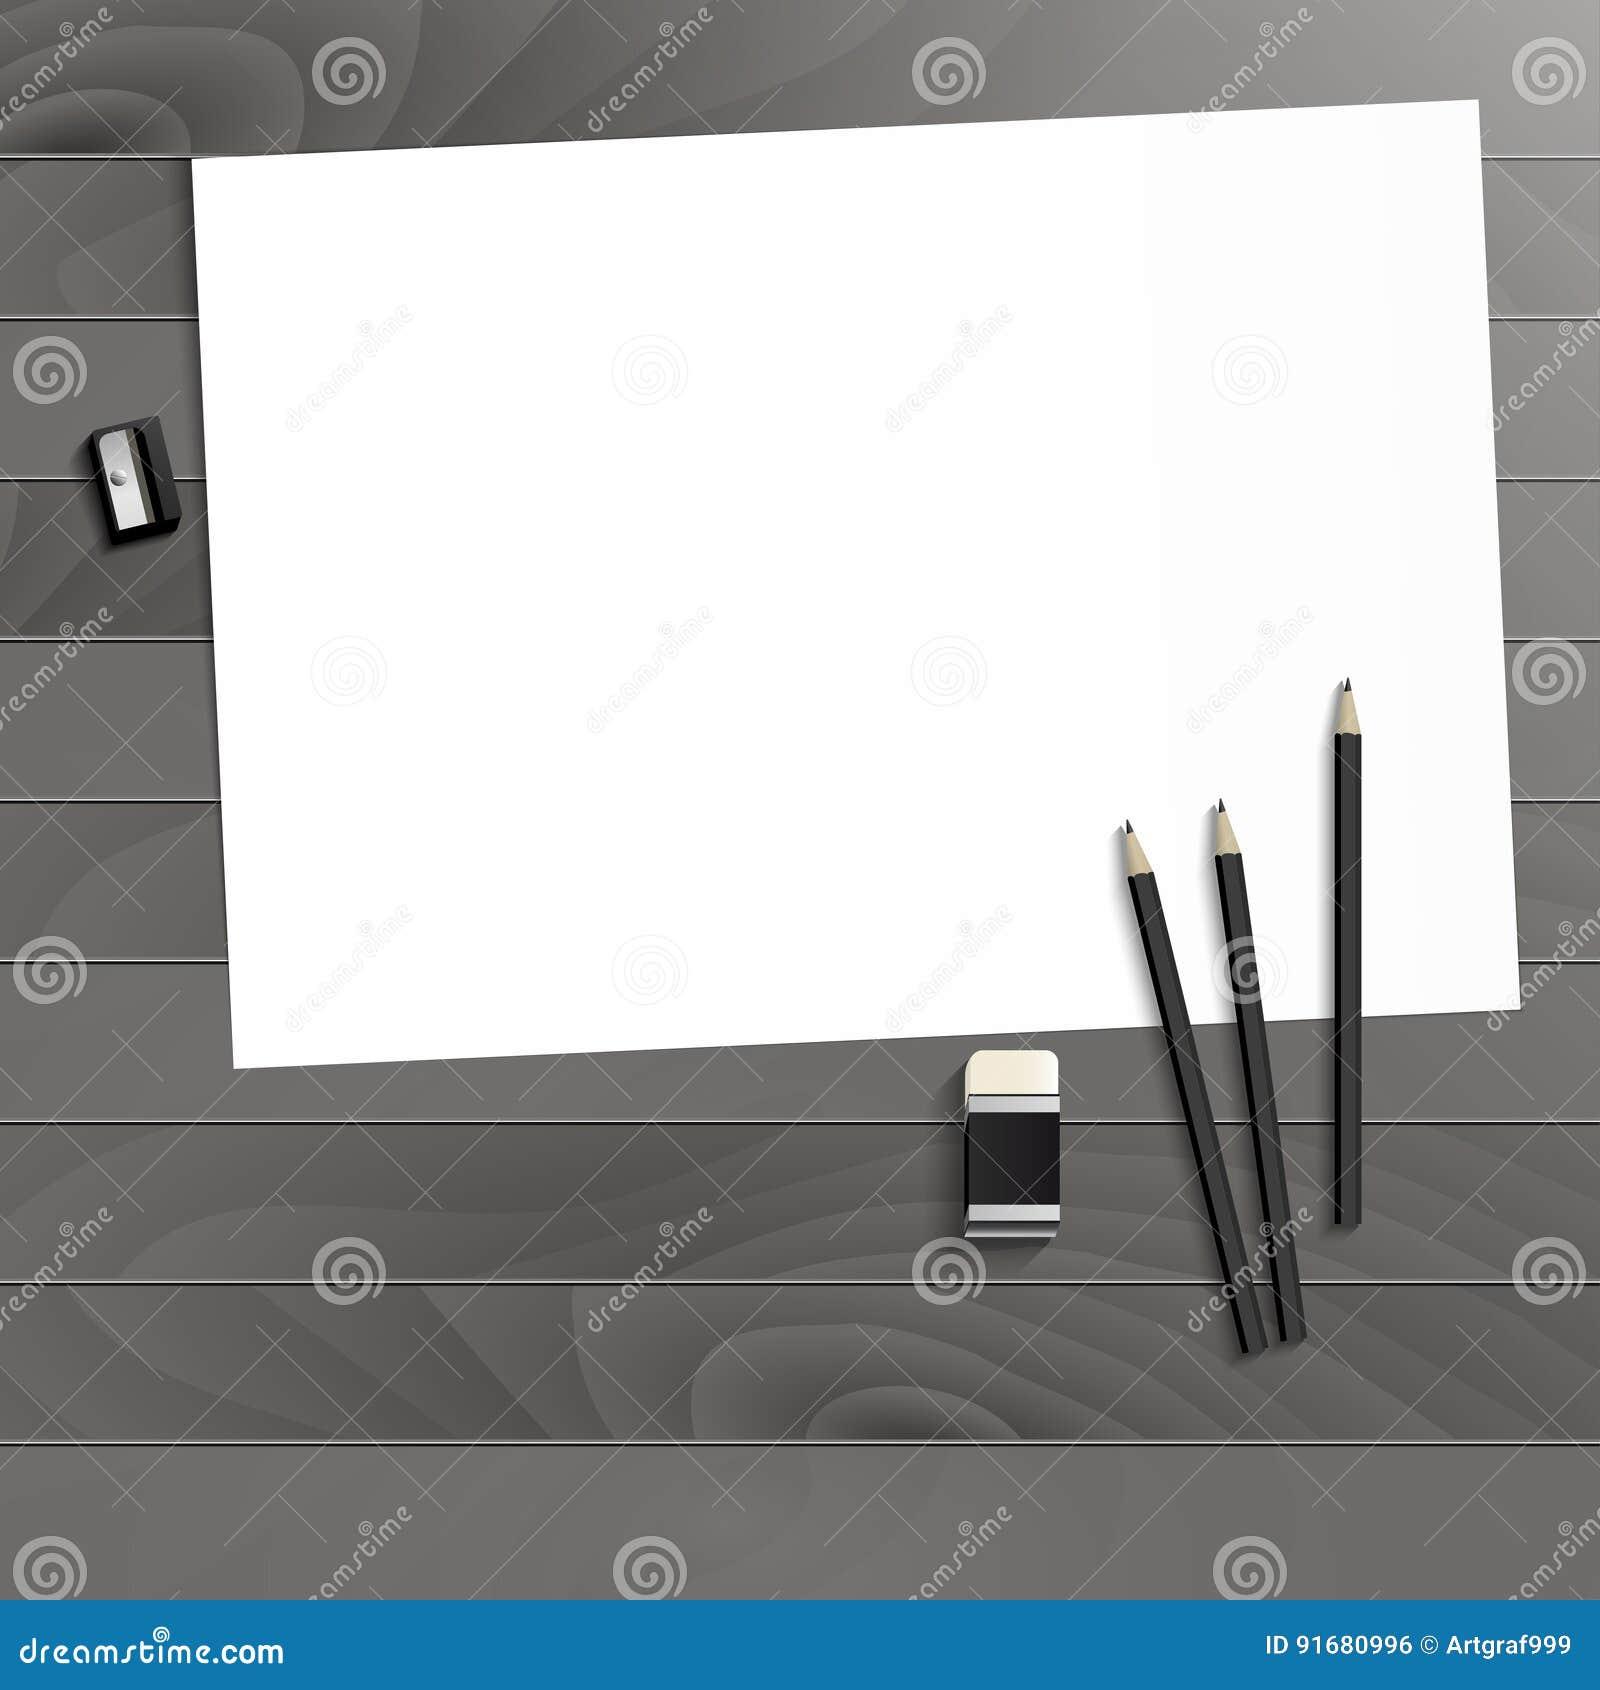 board of directors art paper Sample board paper format prepared by: effective governance pty ltd level 3, 16 mcdougall street po box 2140 milton qld 4064 phone: (07) 3510 8111.